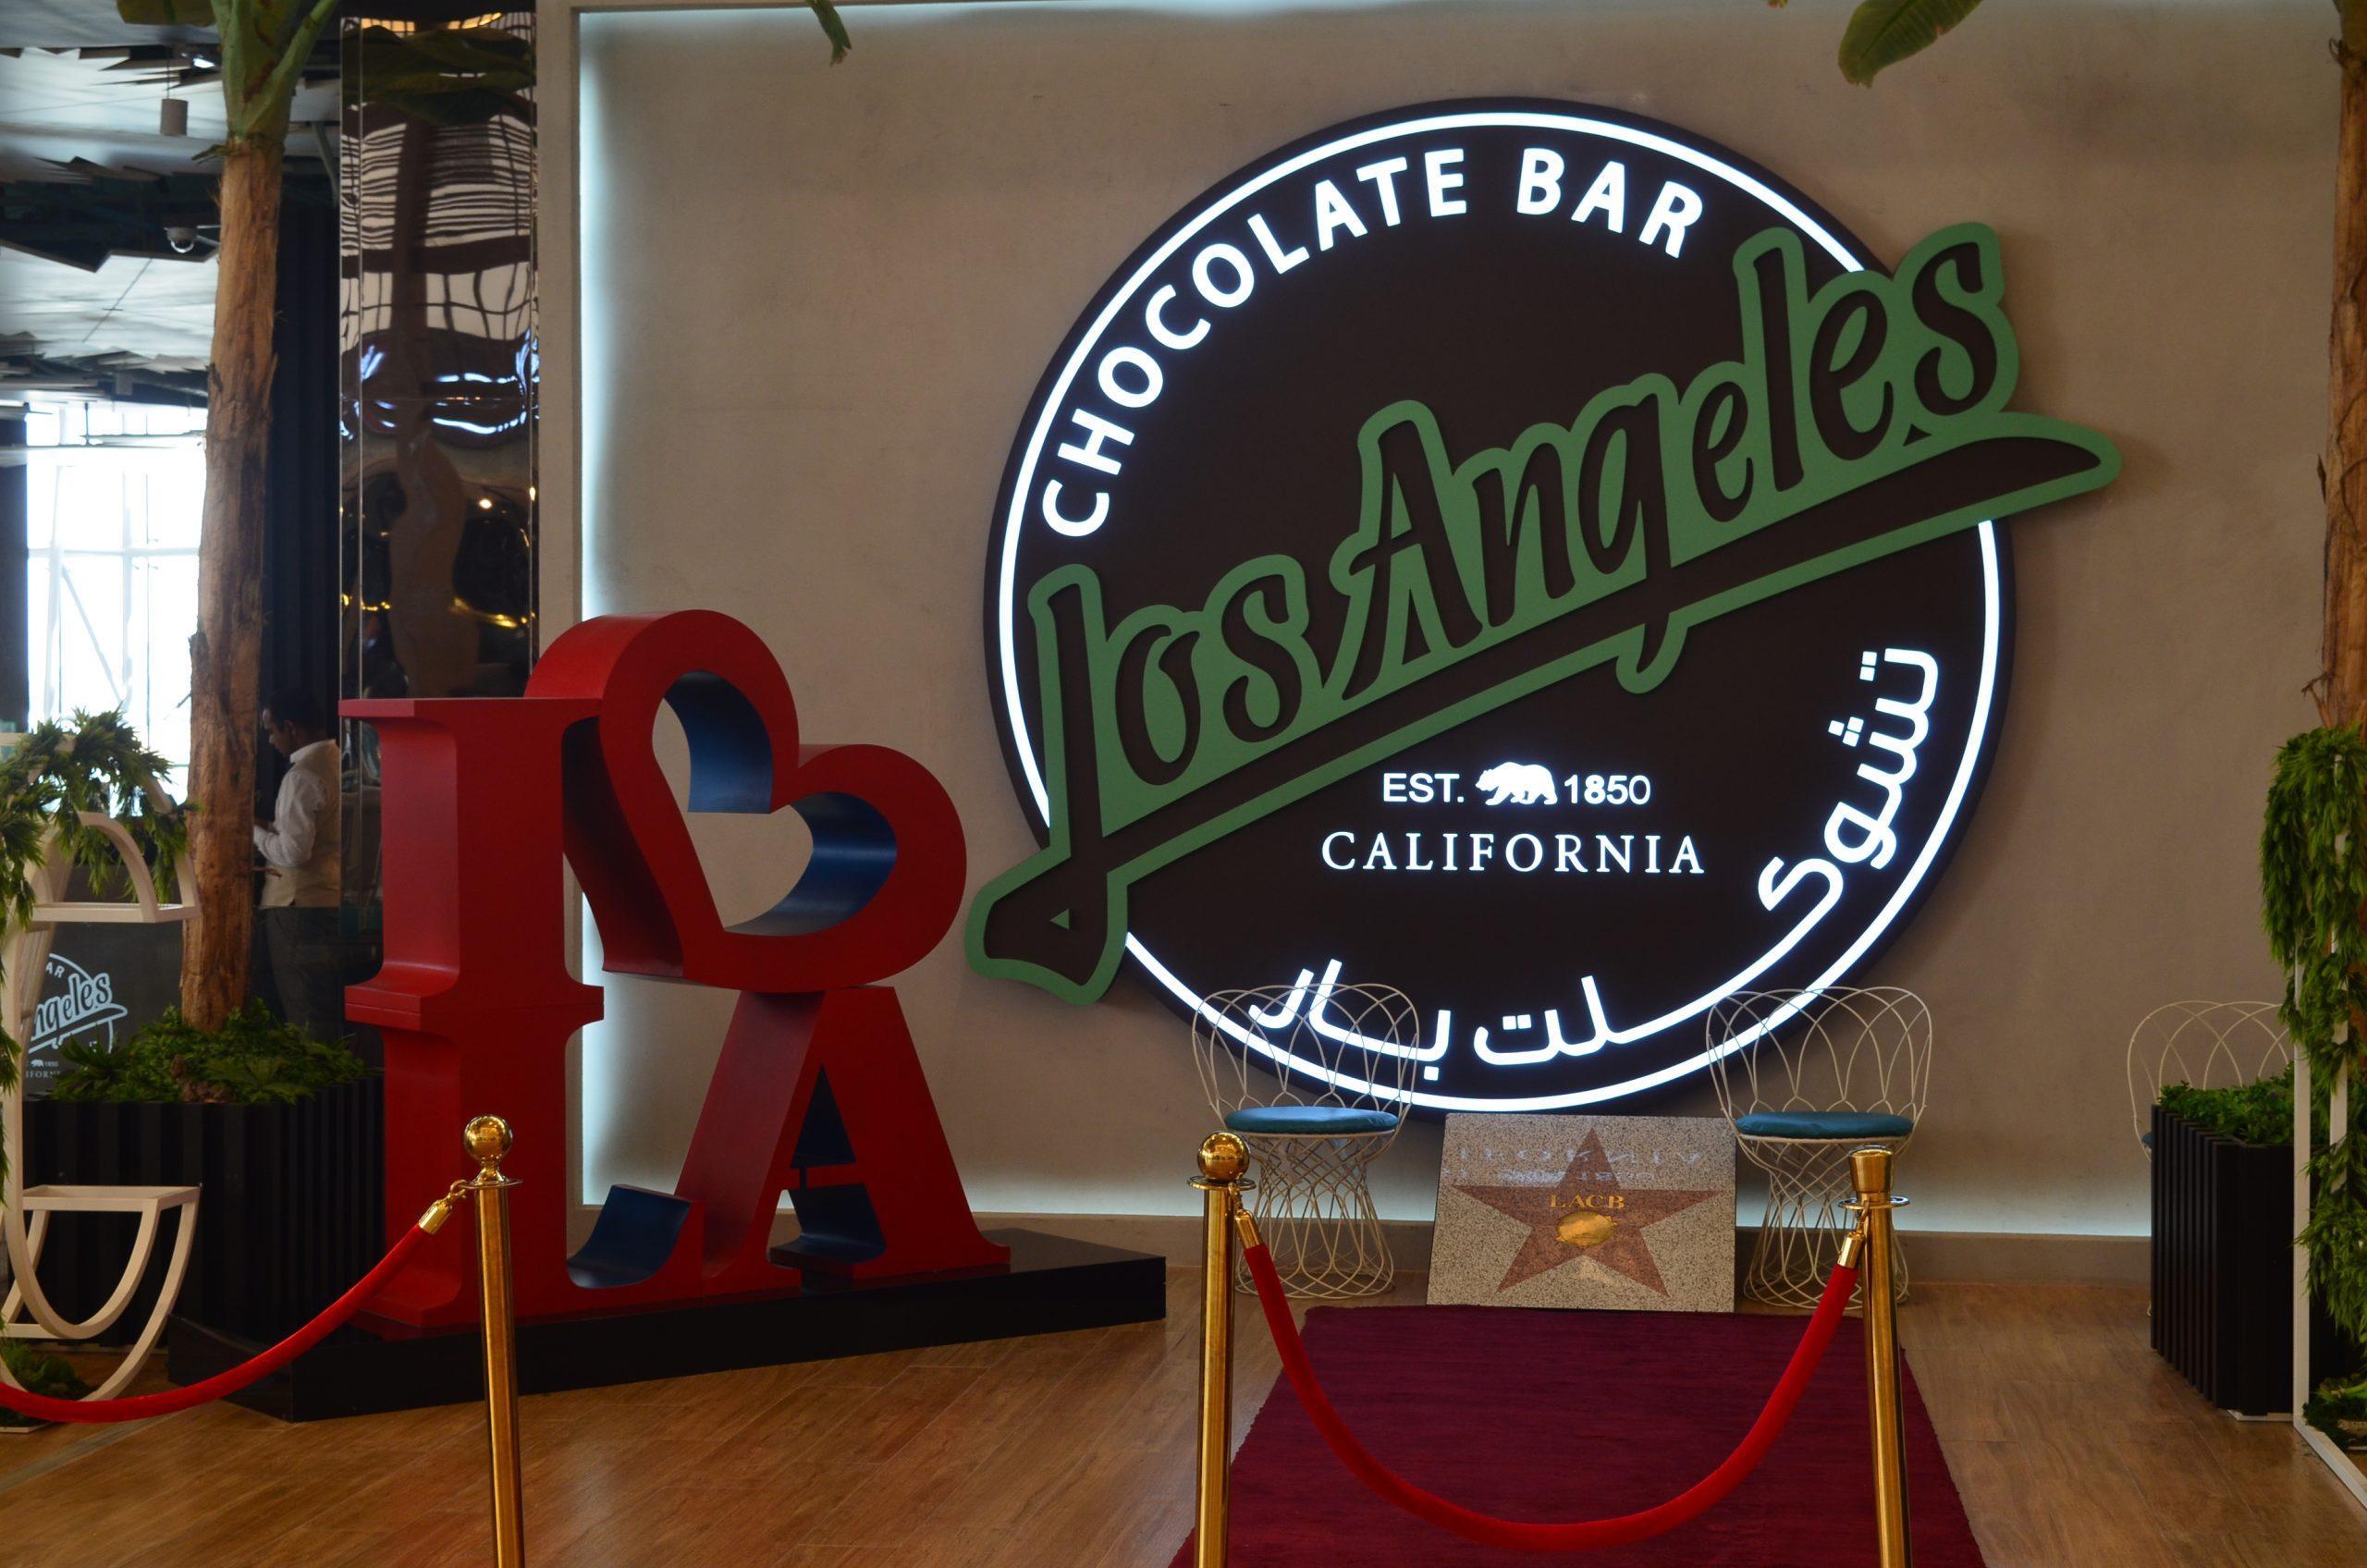 CHOCOLATE BAR gallery